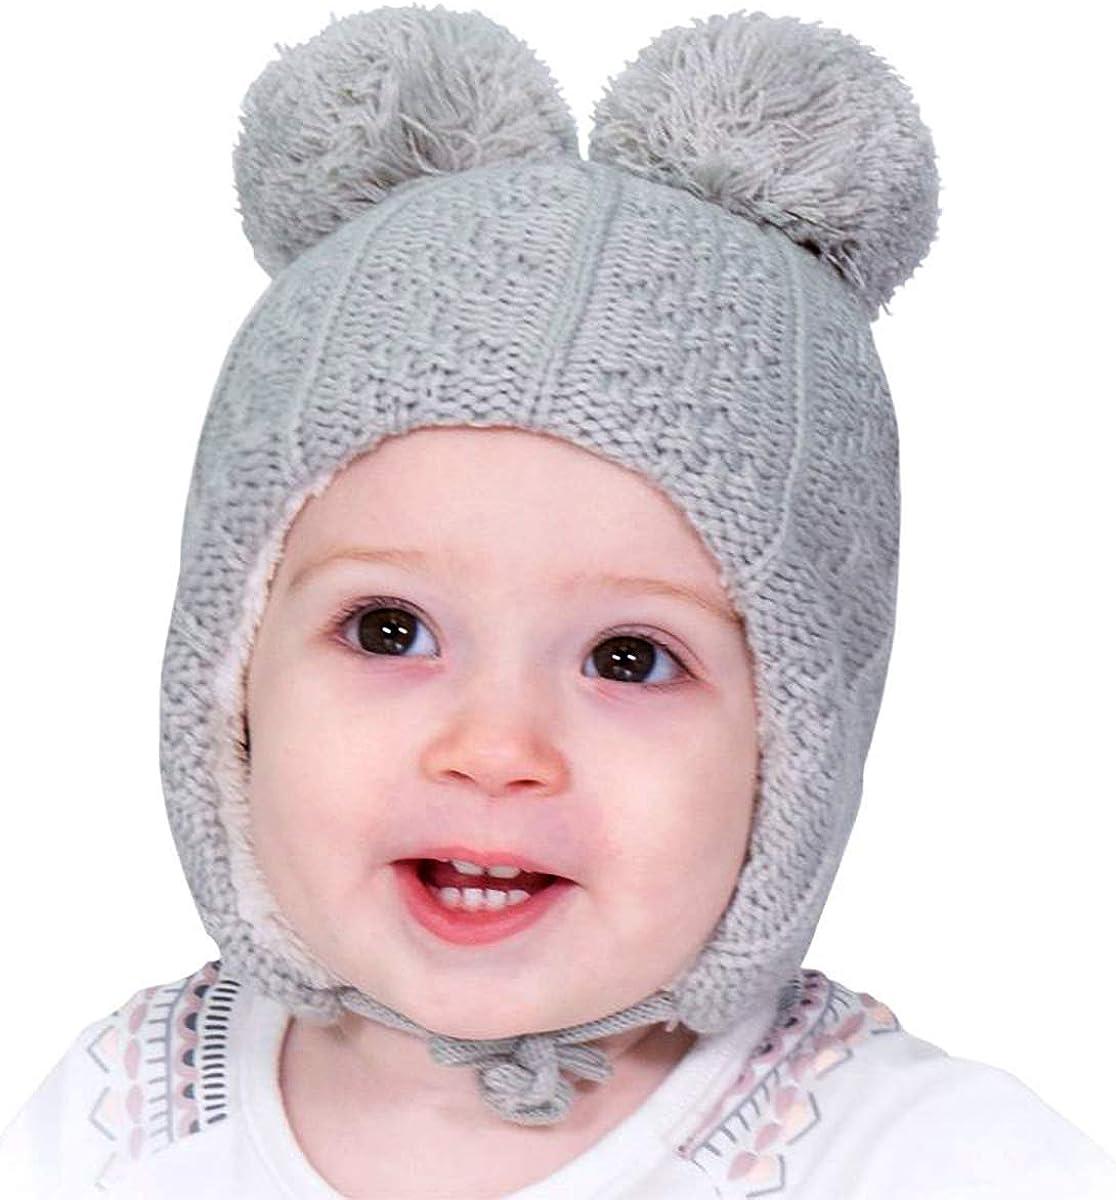 Bear Ears Hudson Baby Boy and Girl Cozy Sherpa Hat and Mitten Set Bear Ears